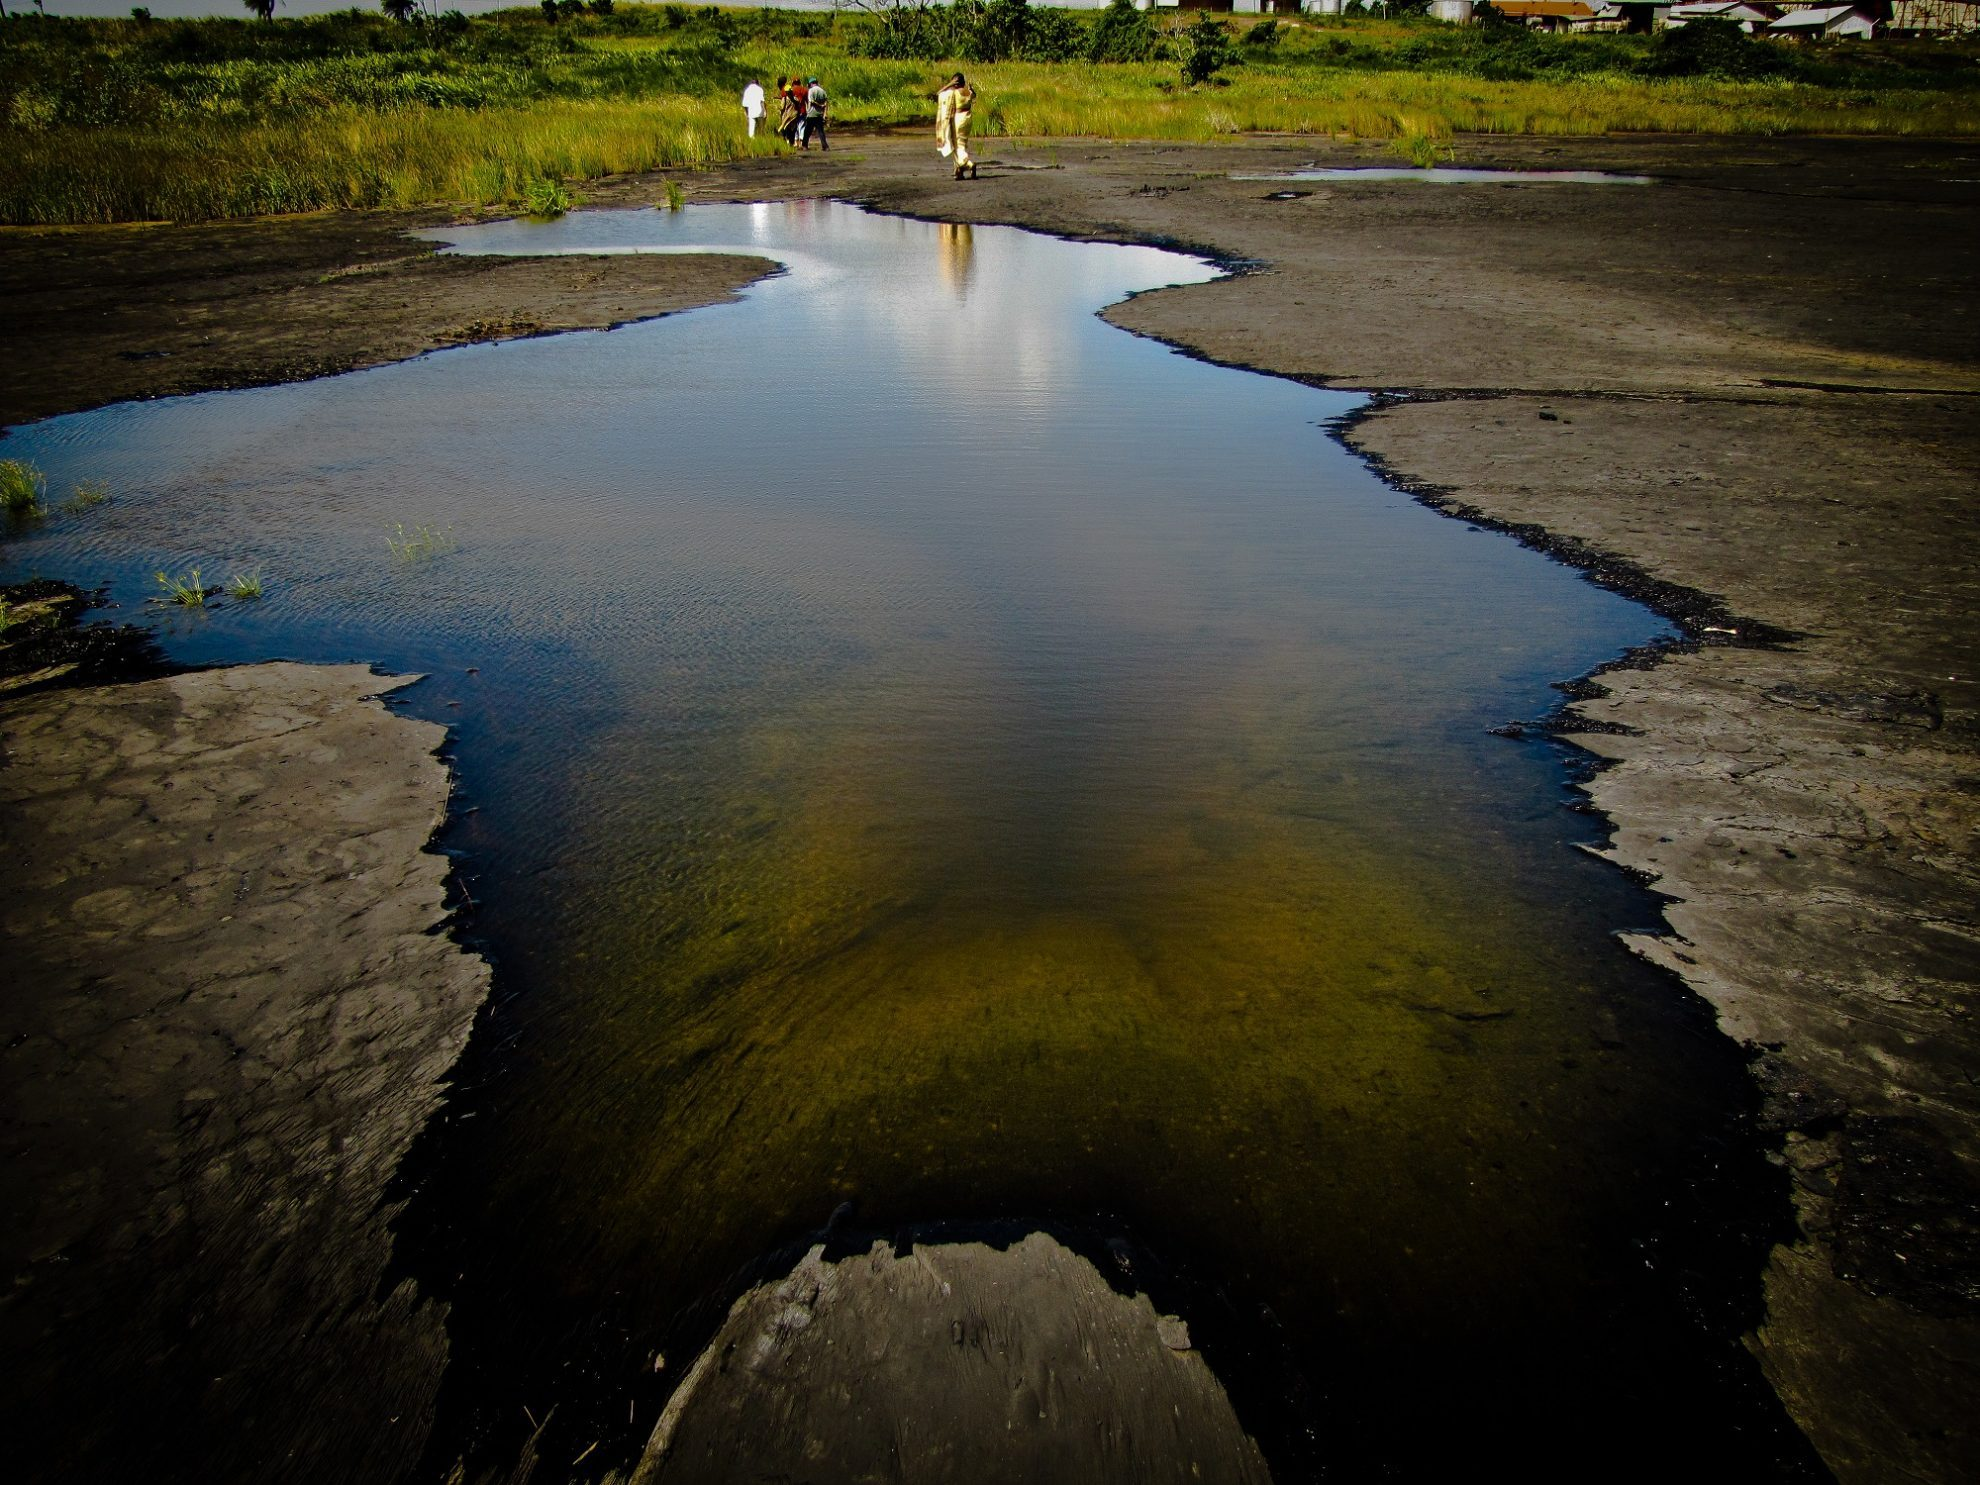 http://ocean-media.su/wp-content/uploads/2015/11/Prirodny-j-fenomen.-asfal-tovoe-ozero-Pich-Lejk-v-Trinidade.jpg height=934